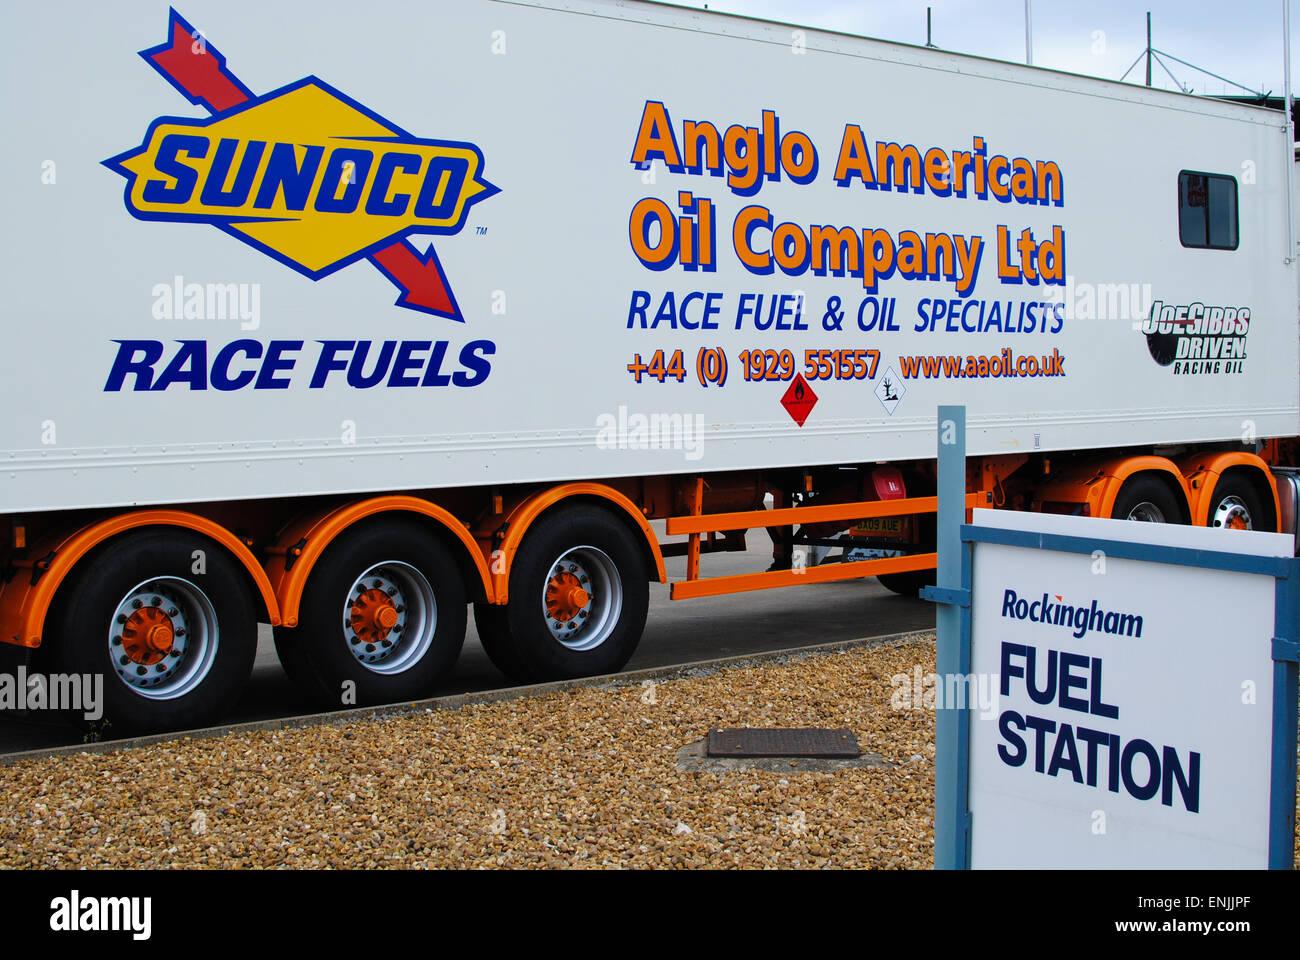 Sunoco Race fuels logo Stock Photo: 82159127 - Alamy